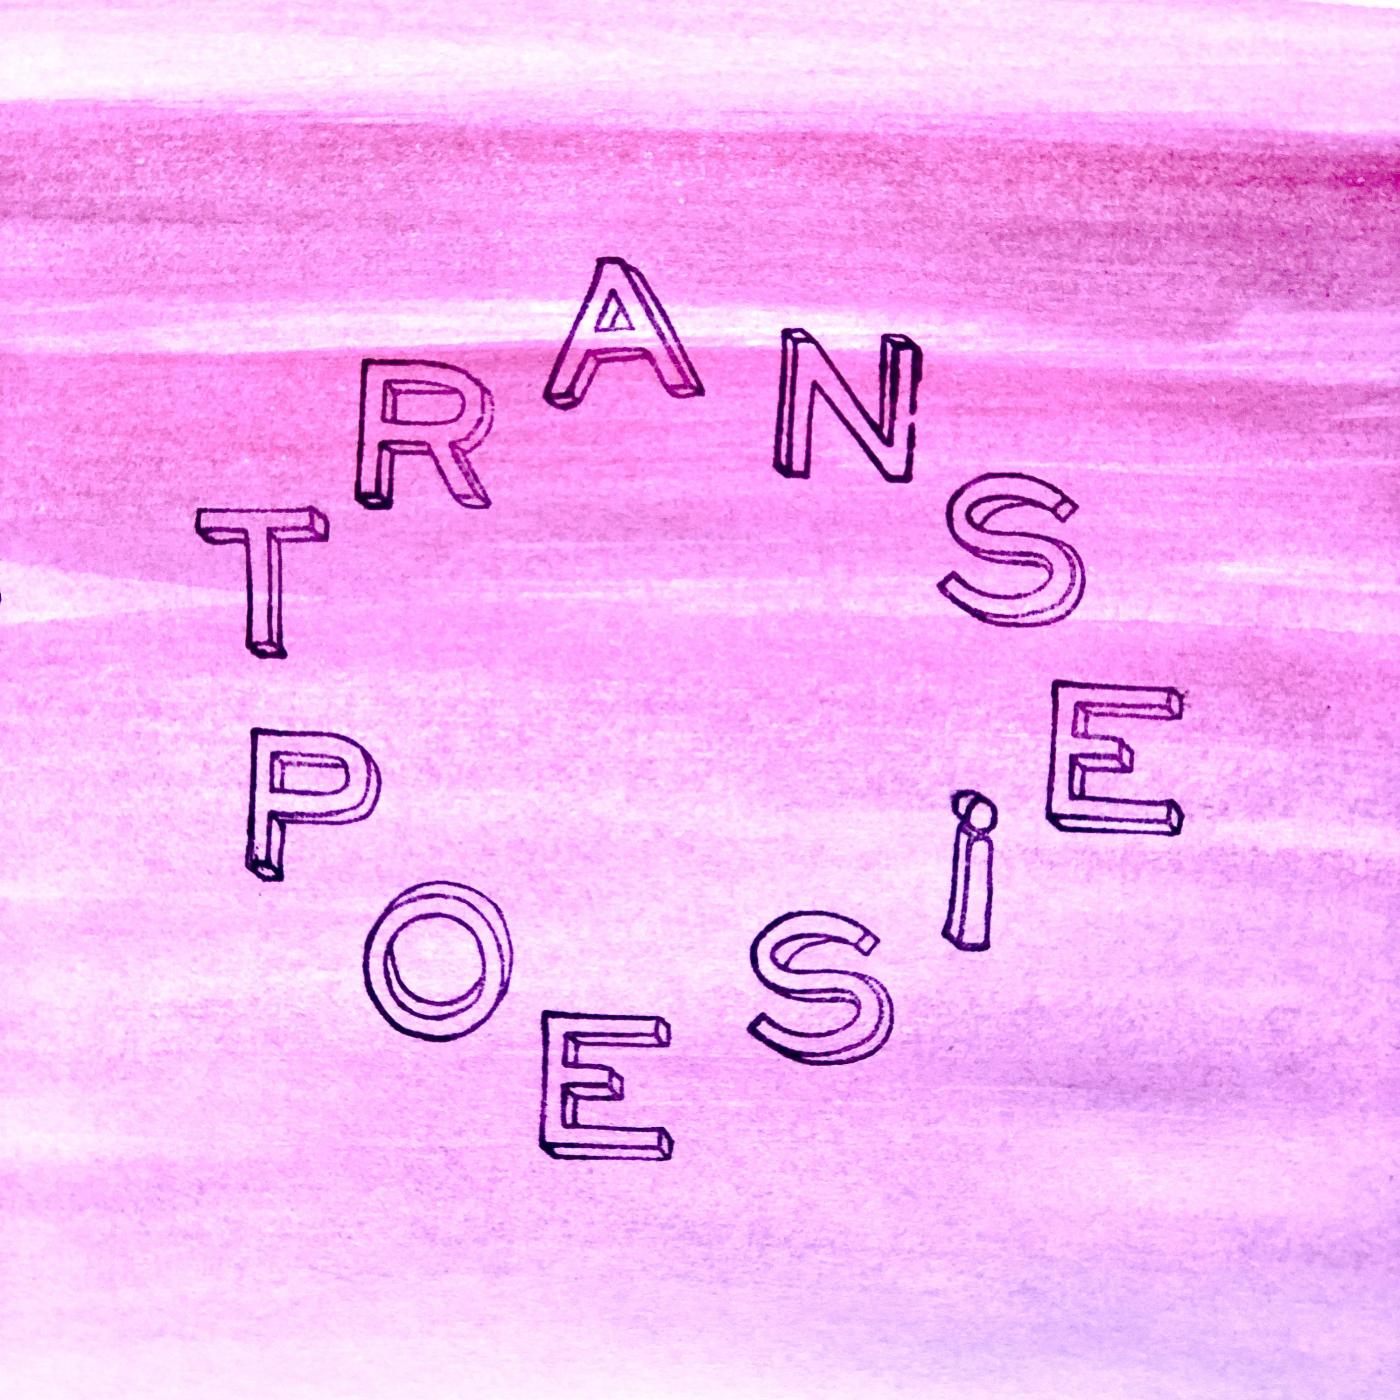 Transpoésie